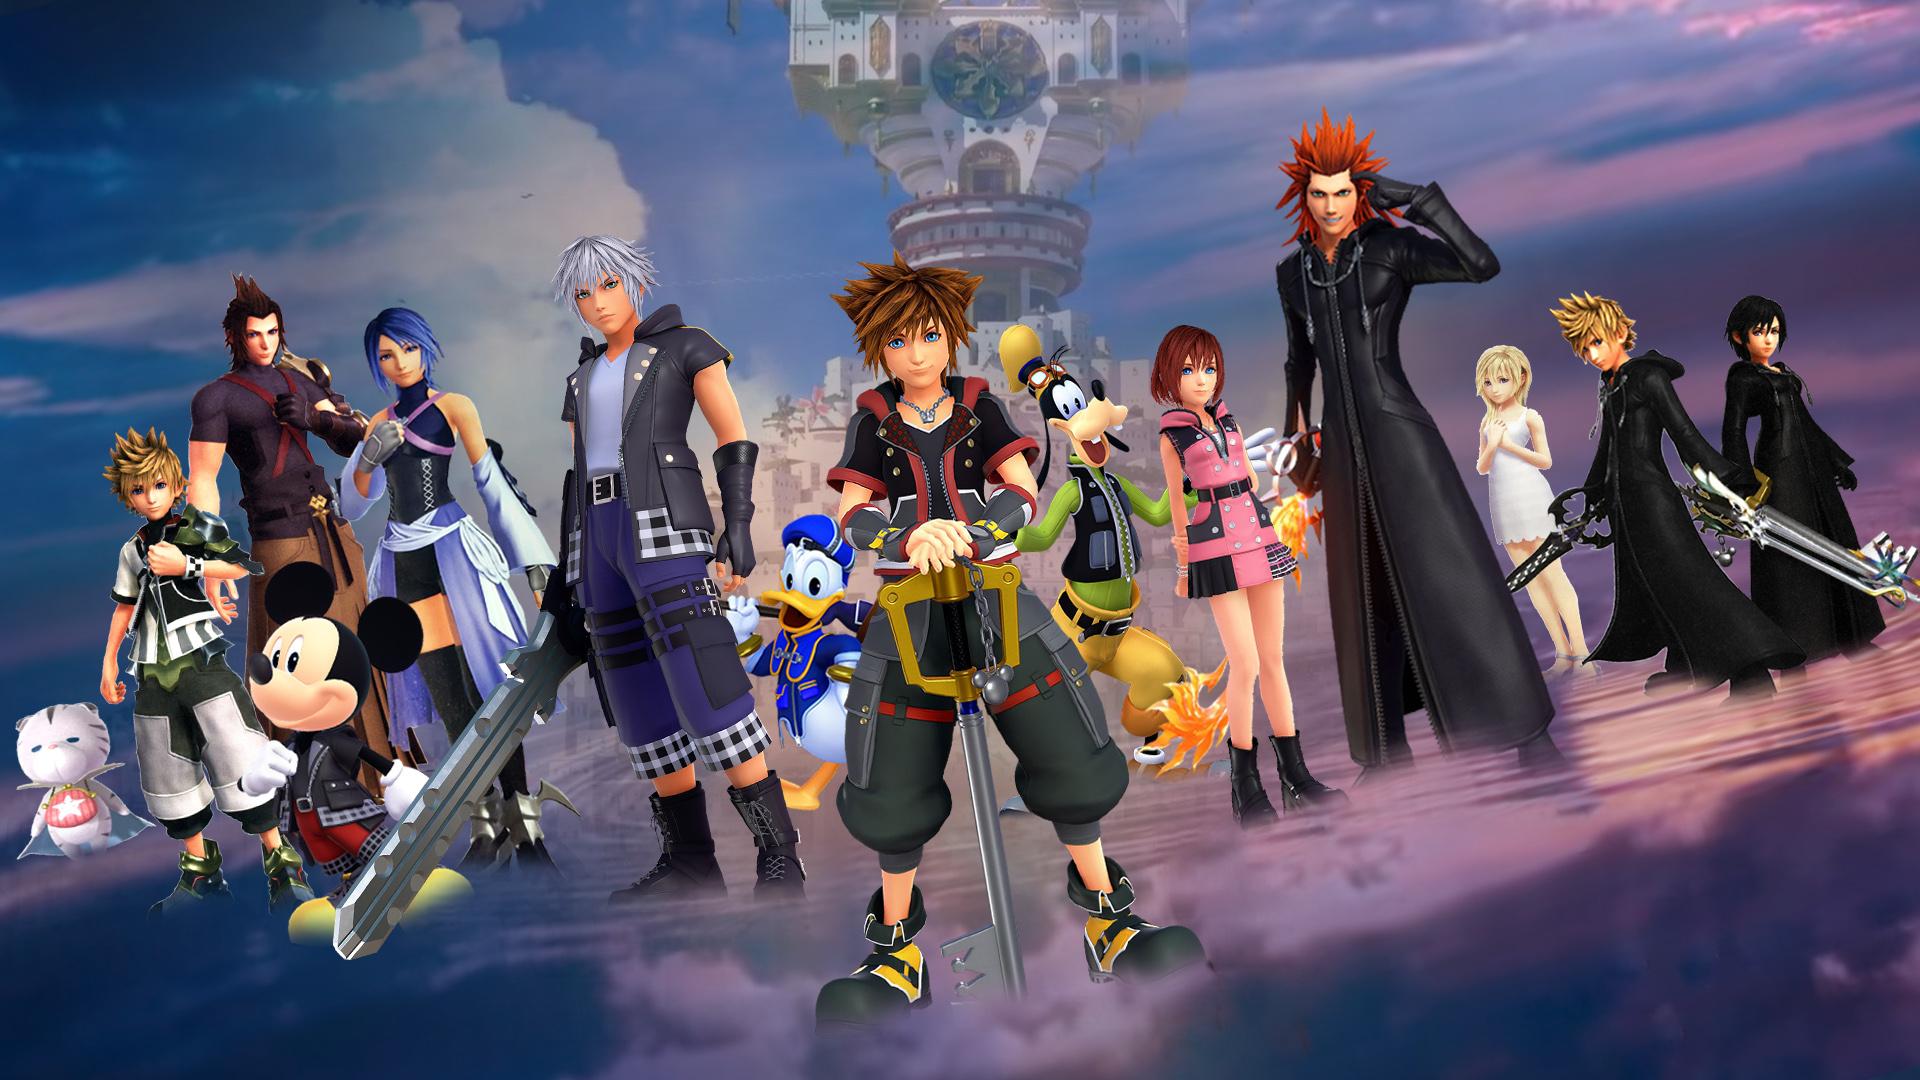 Kingdom Hearts Iii Wallpaper Heroes Of Light By The Dark Mamba